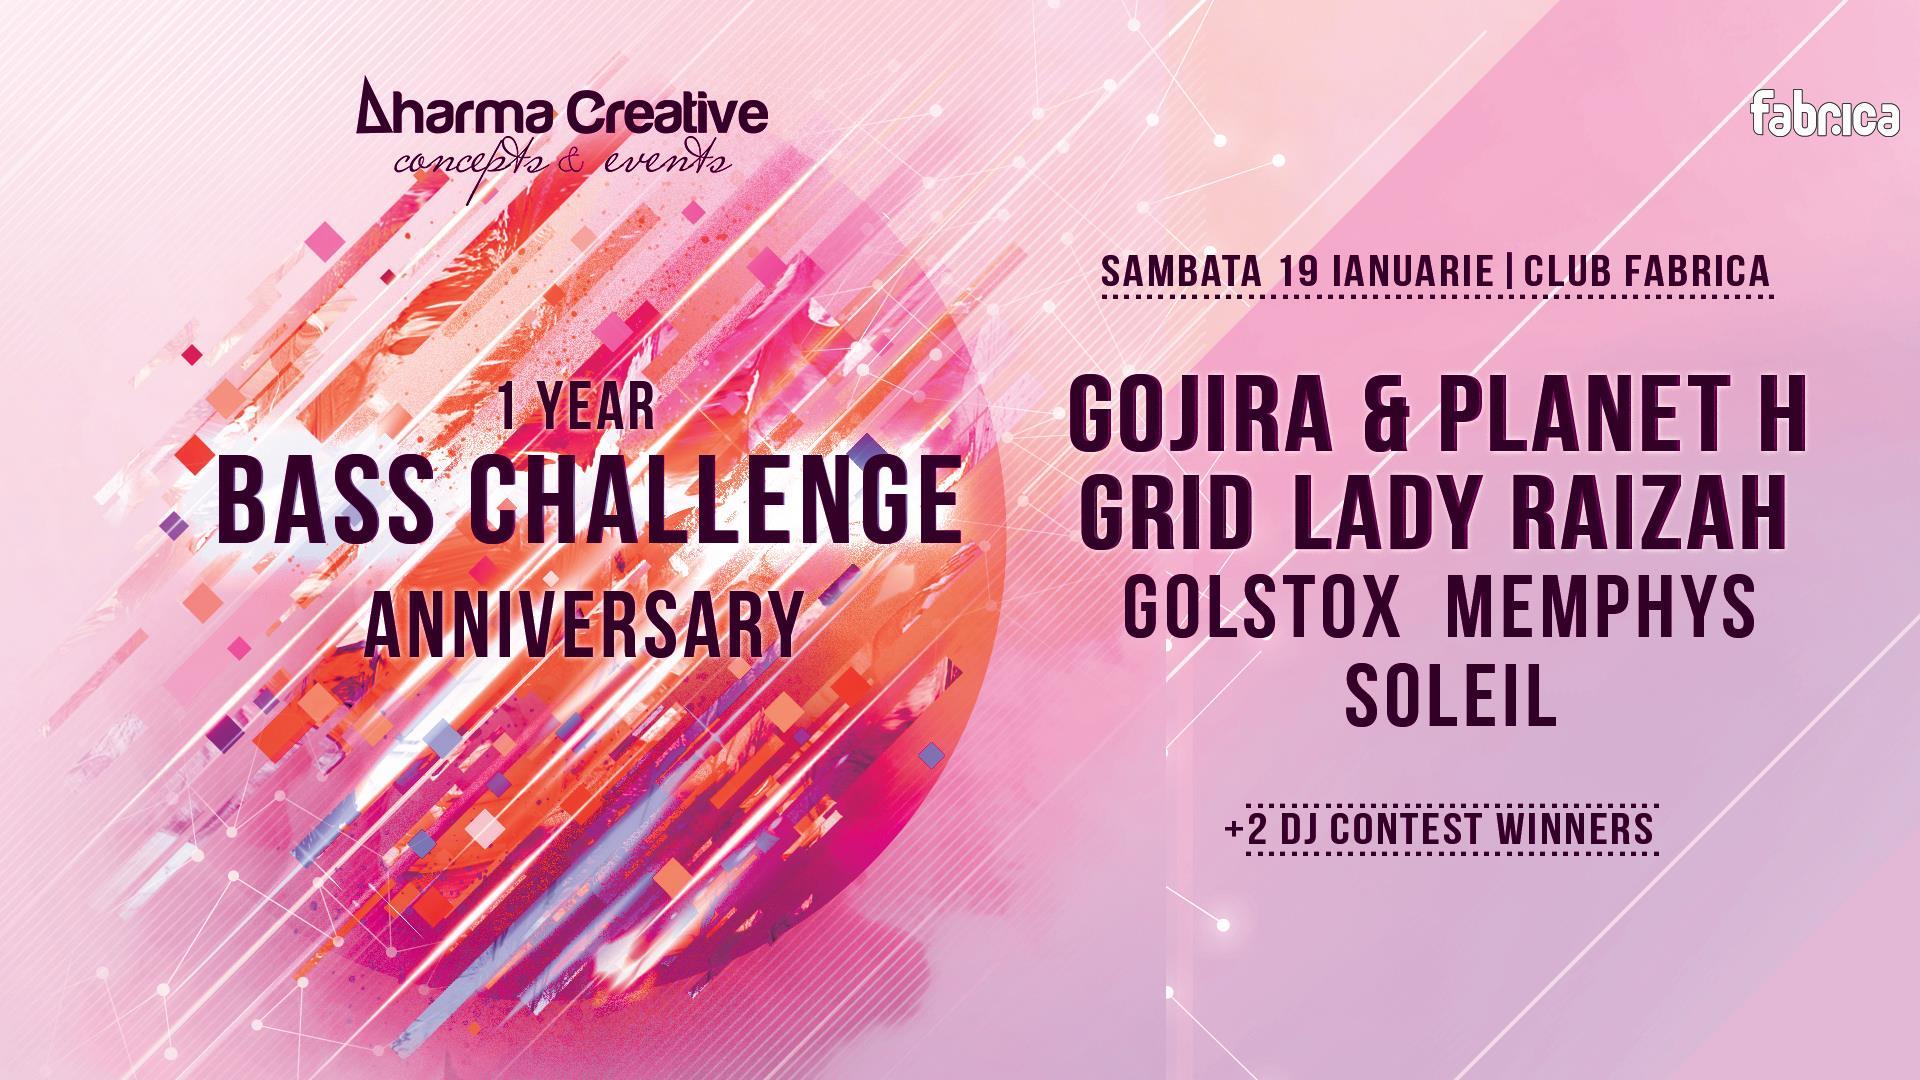 Bass Challenge ● 1 Year Anniversary ● Gojira Planet H ● Grid